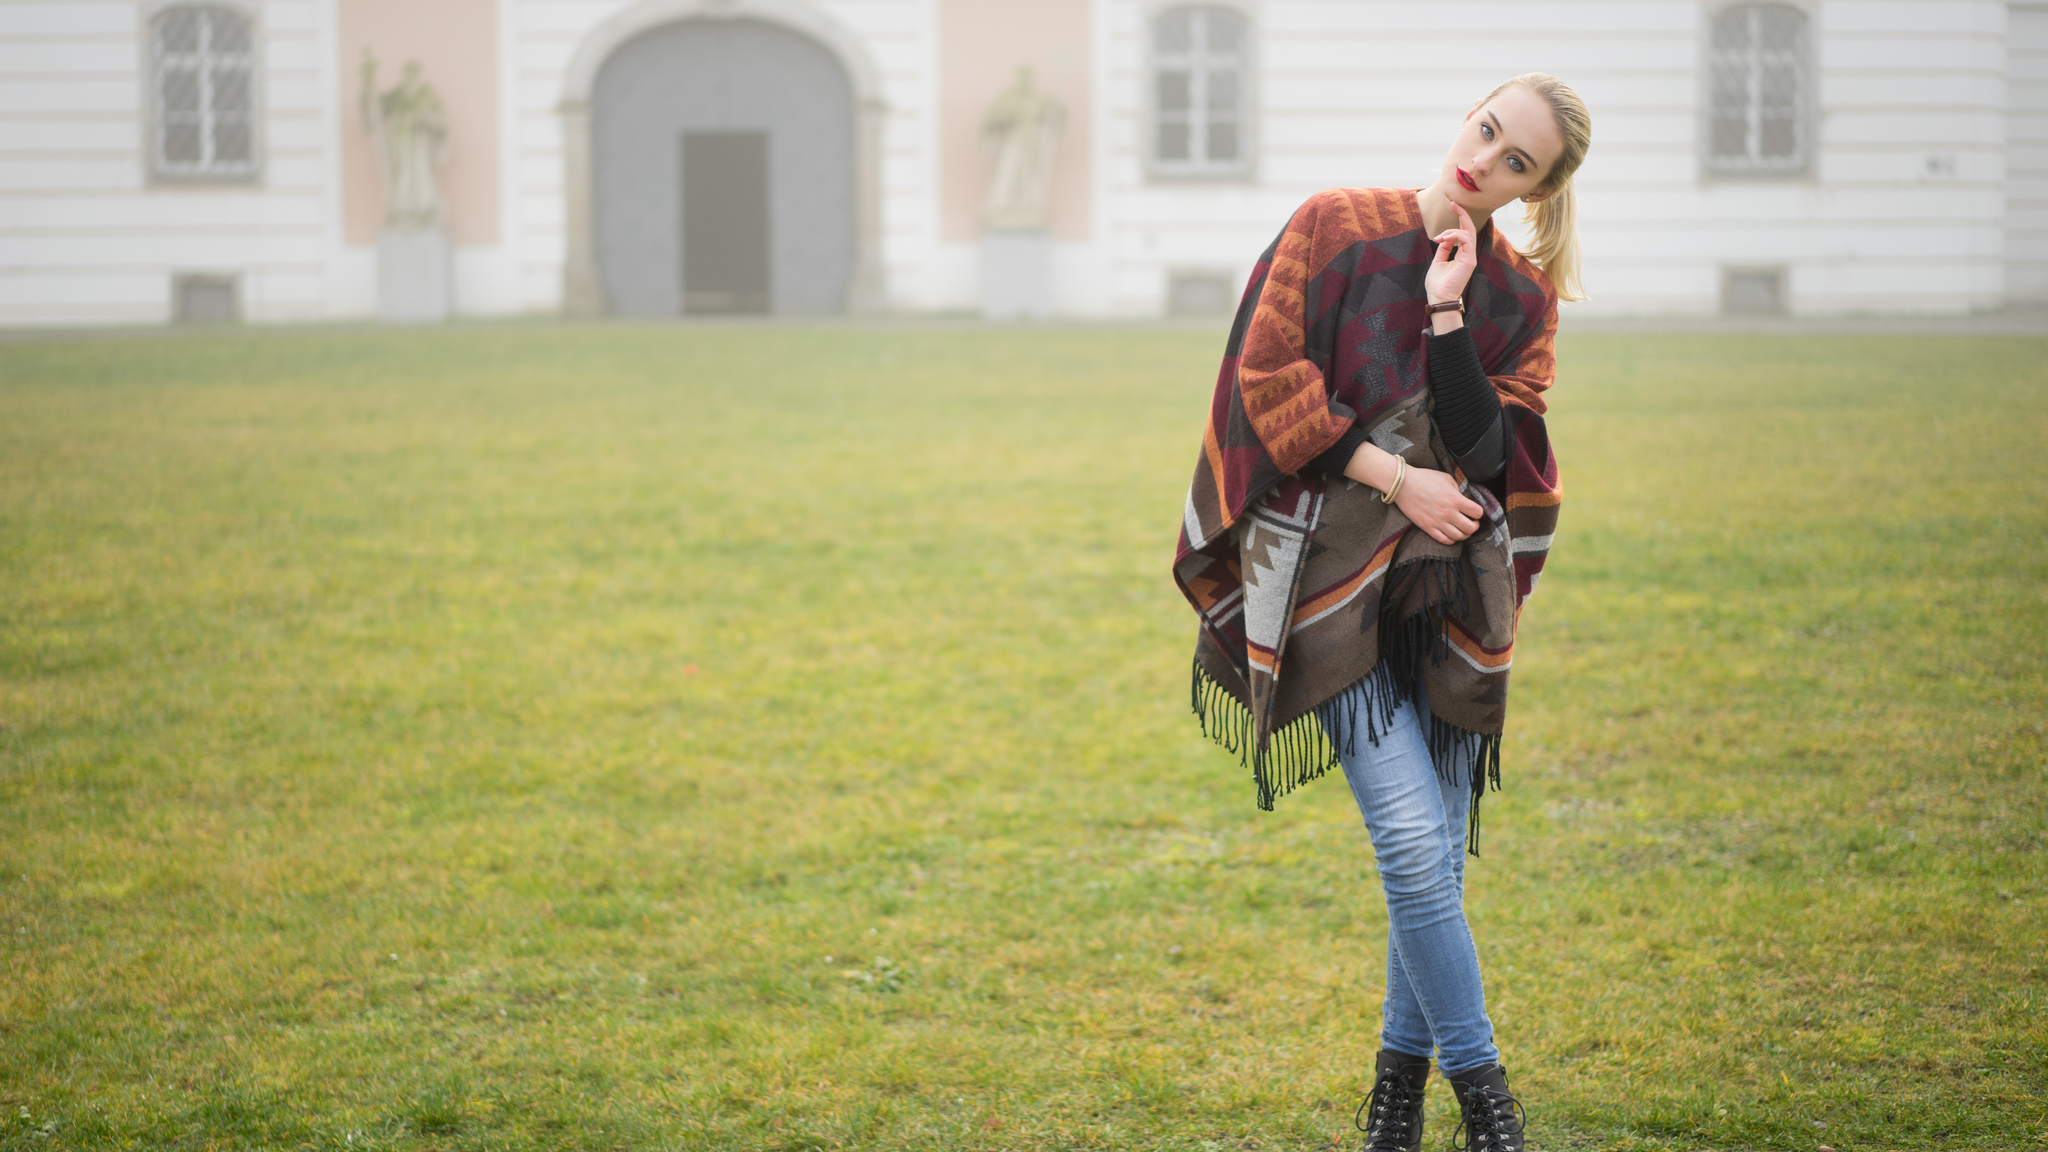 pony-tail-blonde-girl-5k-v1.jpg